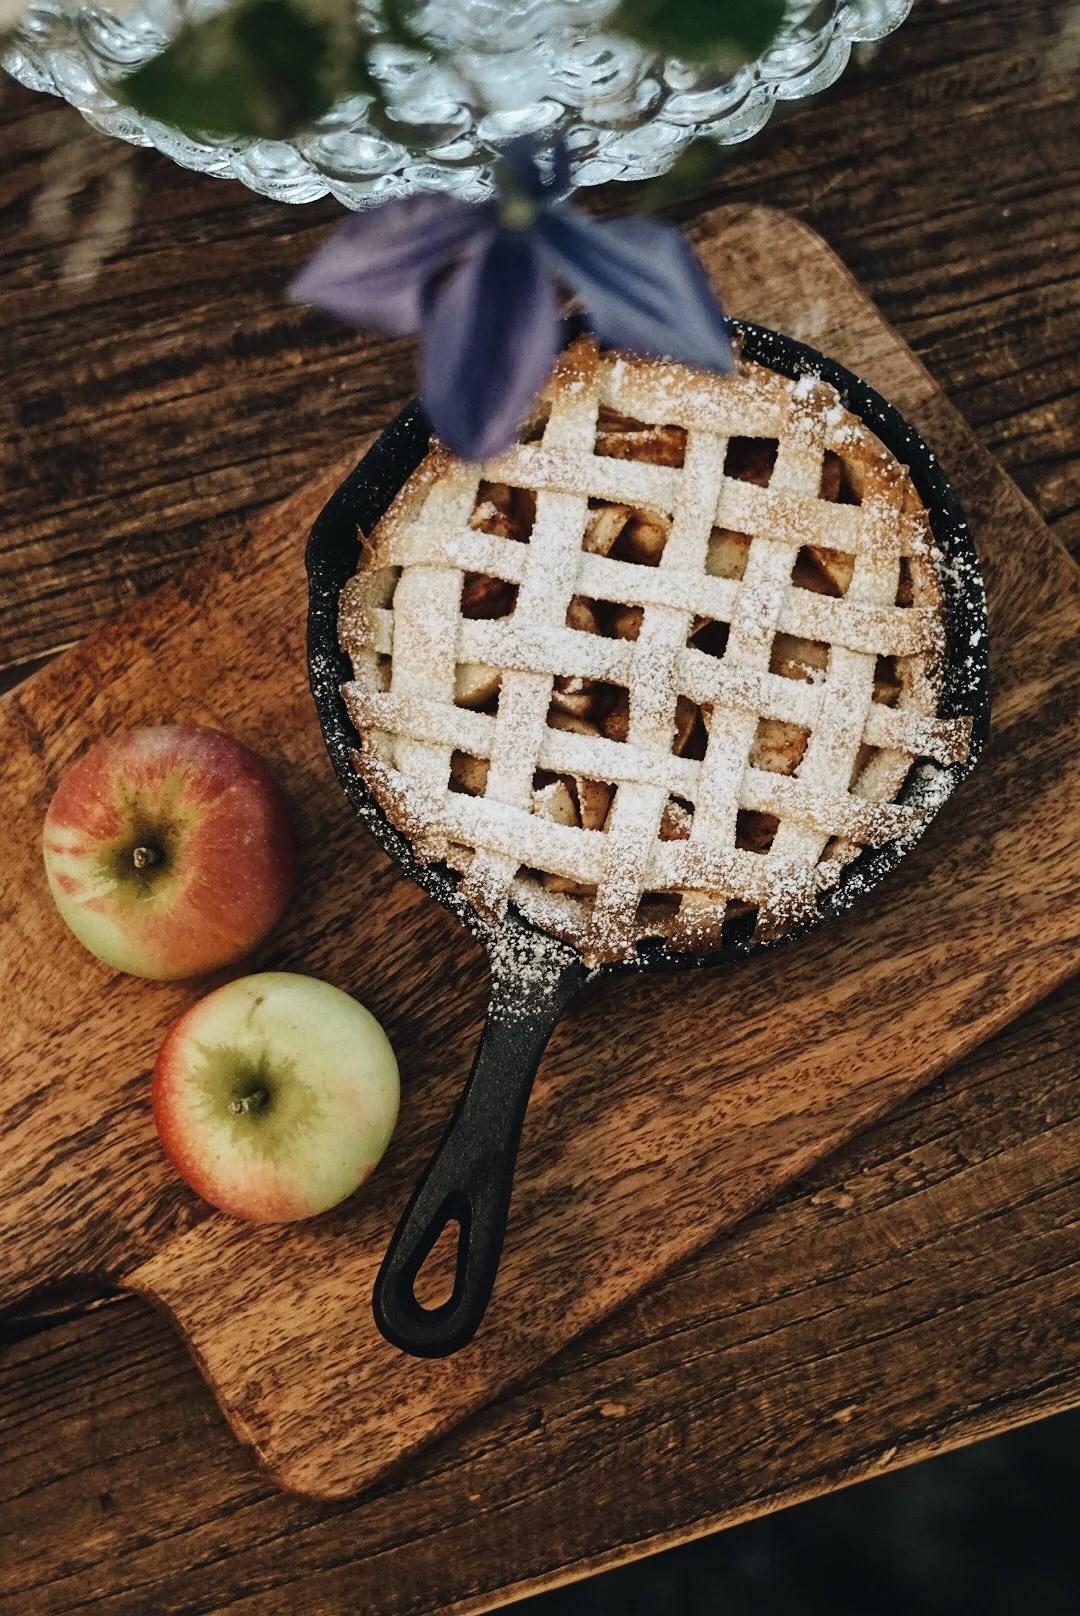 More apple pie!